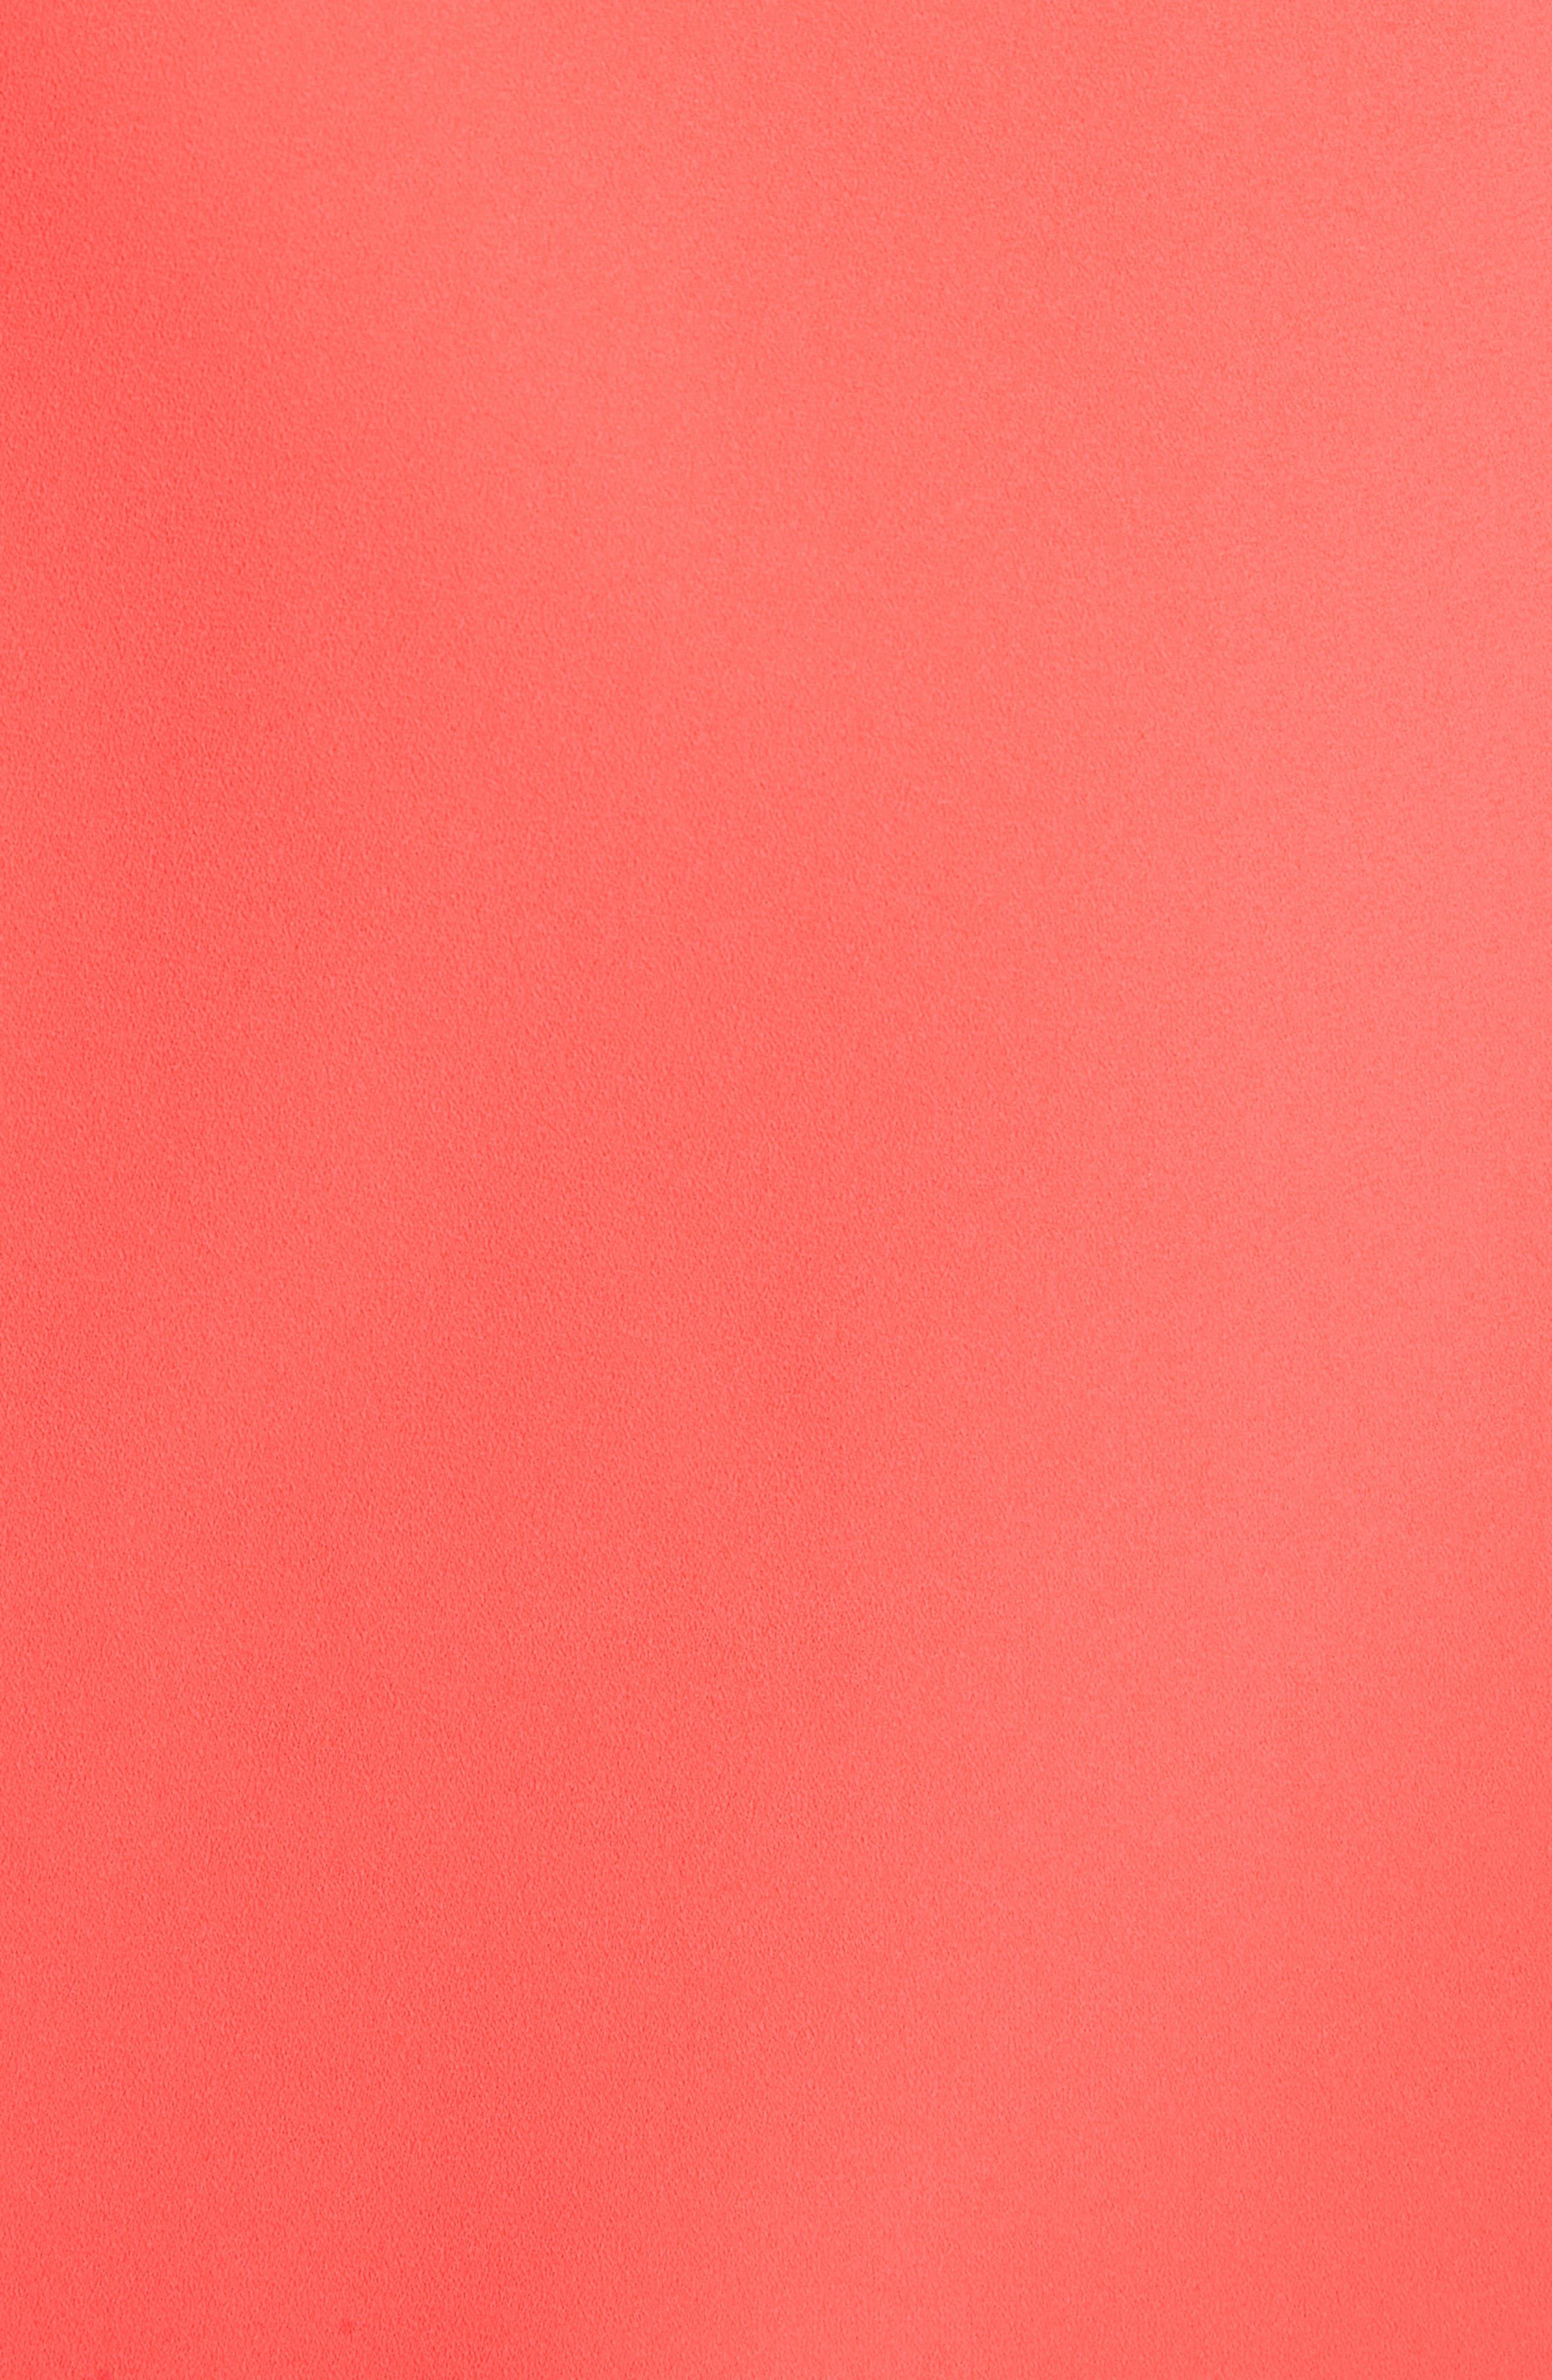 Coley A-Line Shift Dress,                             Alternate thumbnail 6, color,                             800